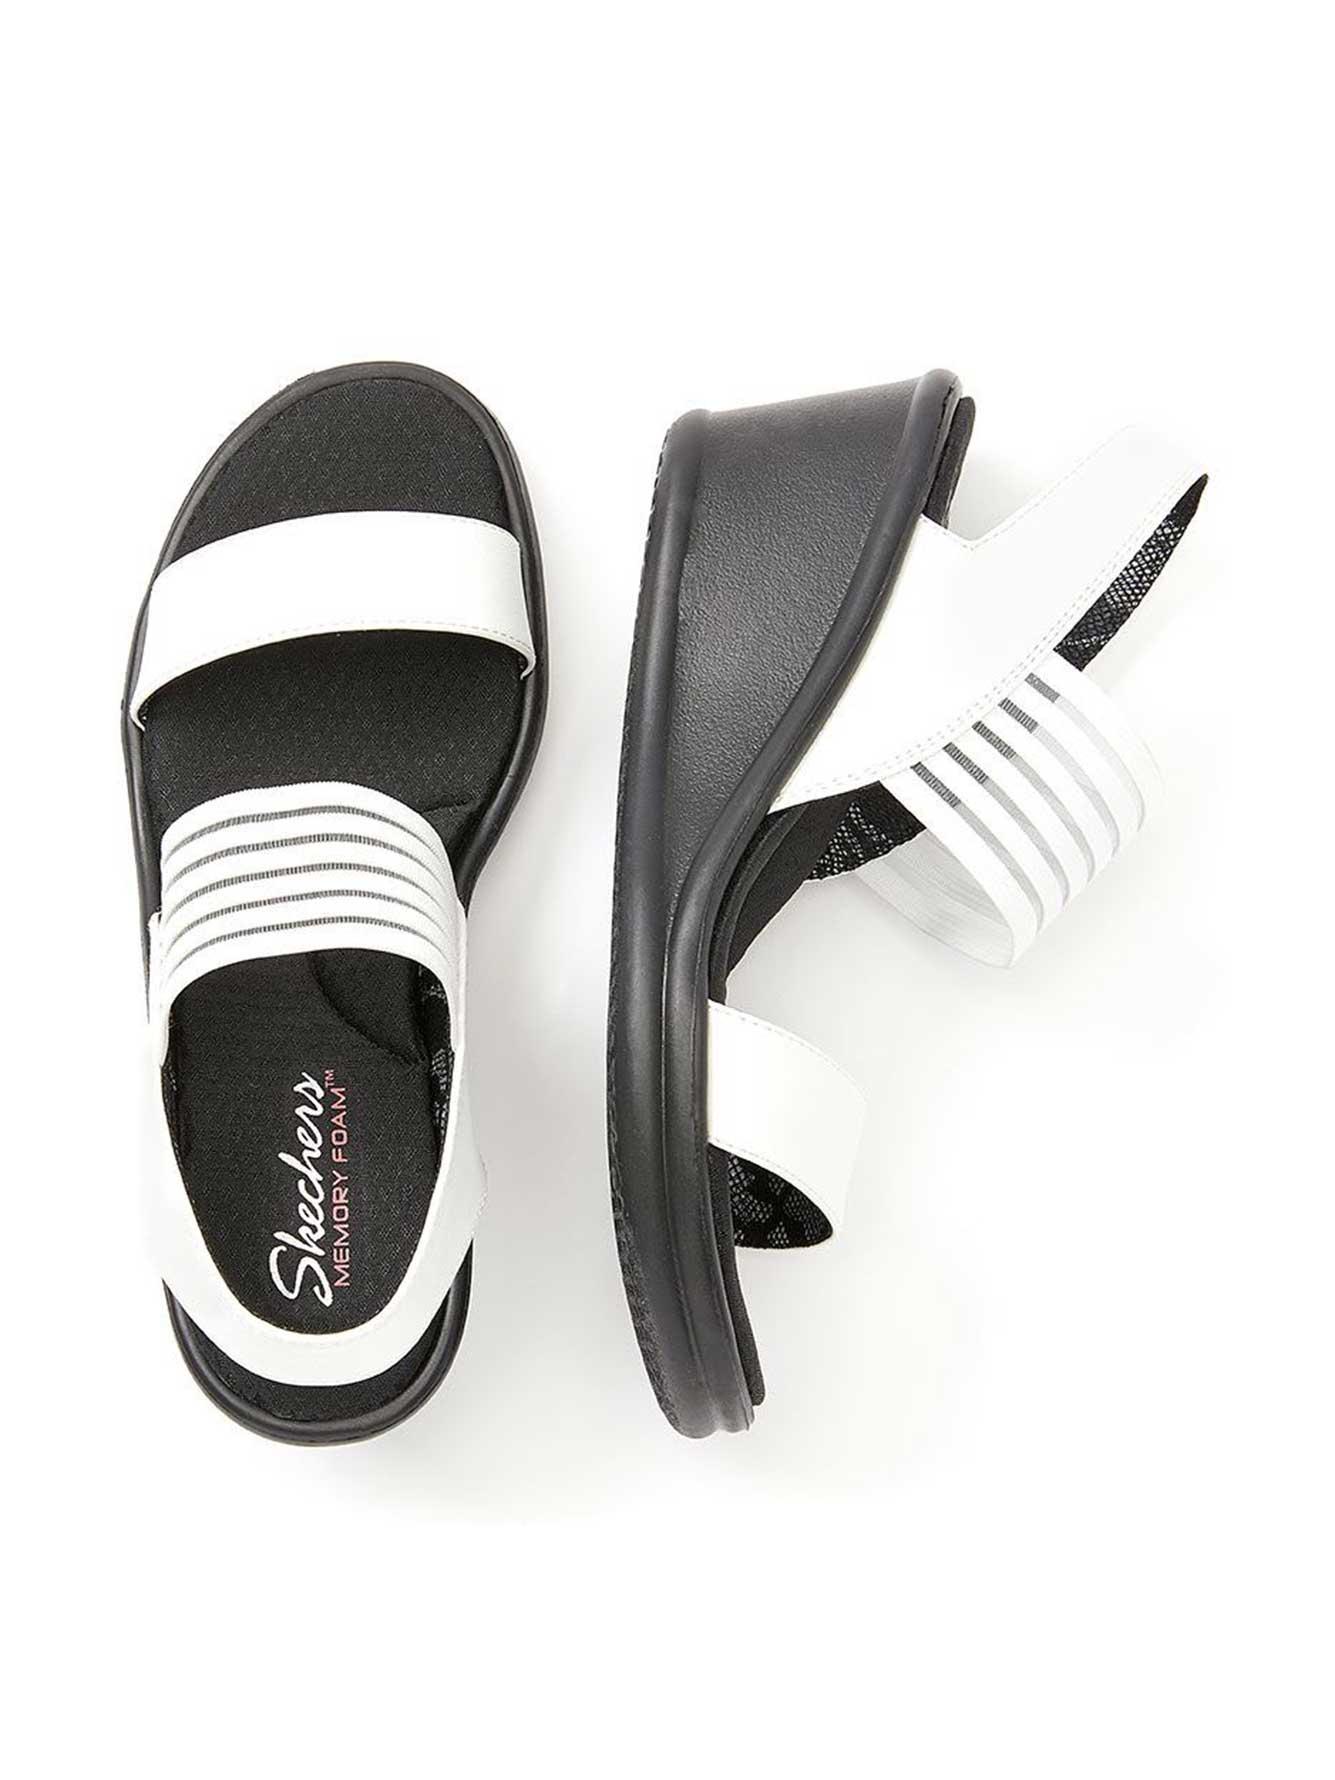 7bf6338446ed Wide-Width Wedge Sandals - Skechers